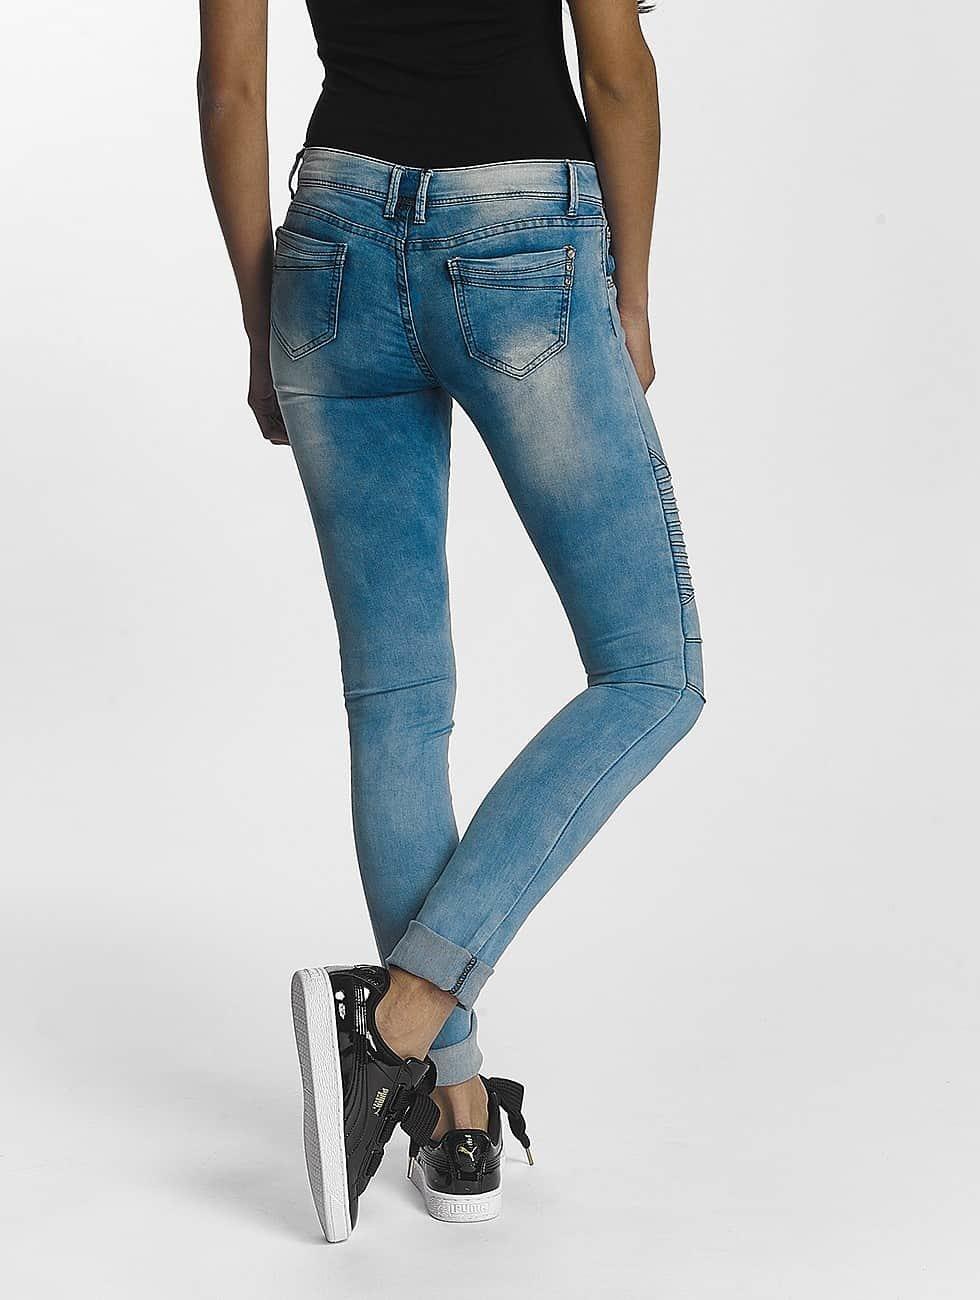 Leg Kings Облегающие джинсы Girl Vivi синий